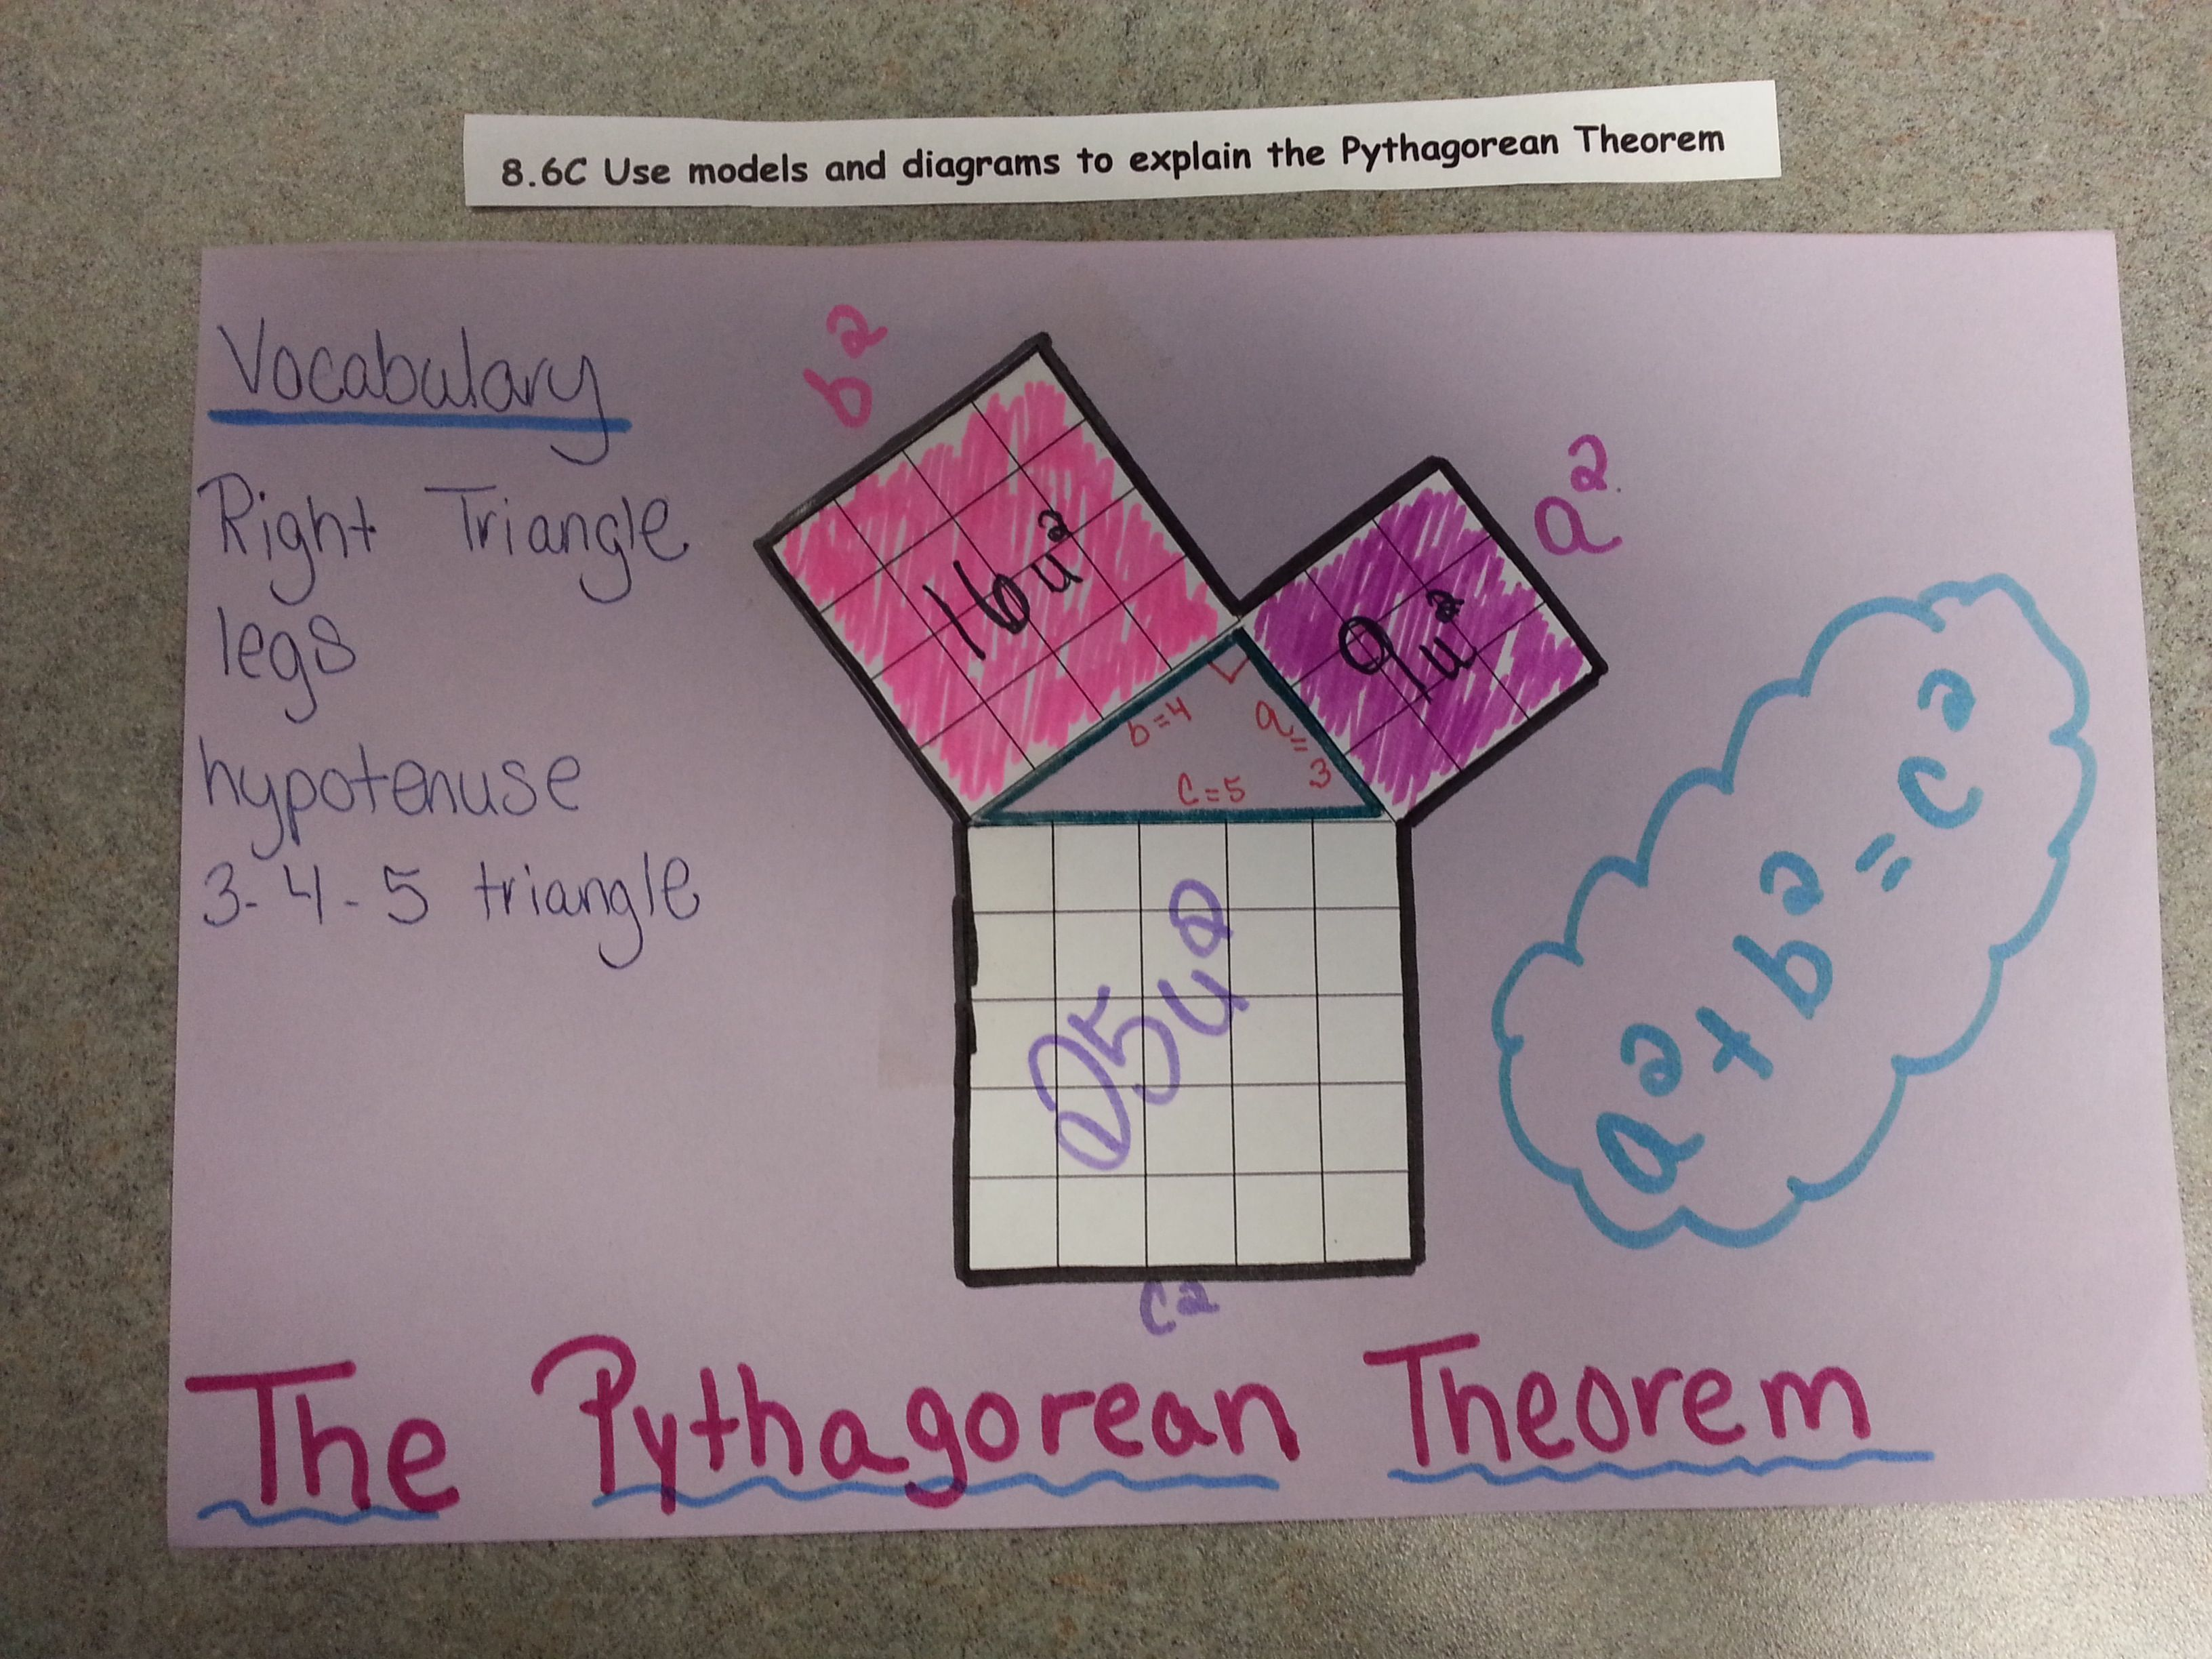 pythagorean theorem Teaching geometry, Math geometry